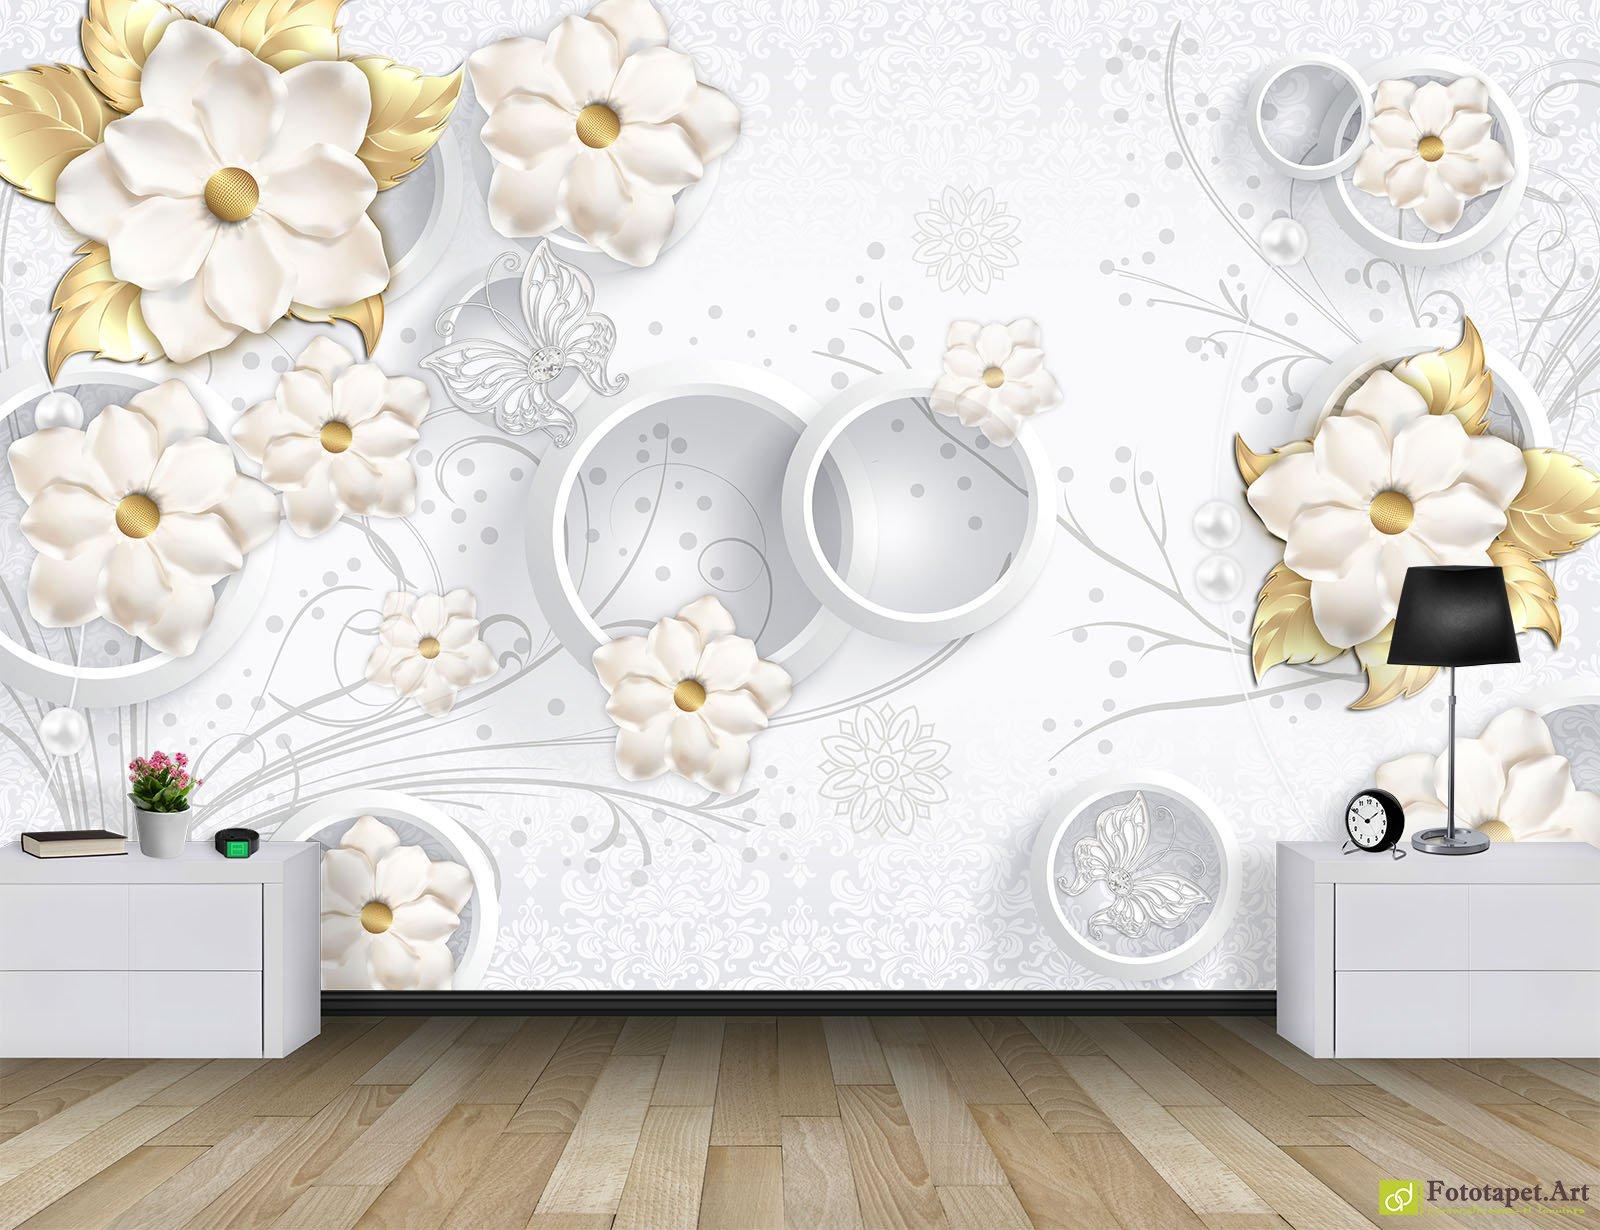 Photo Wallpaper 3D Effect - Golden flowers on a light-colored